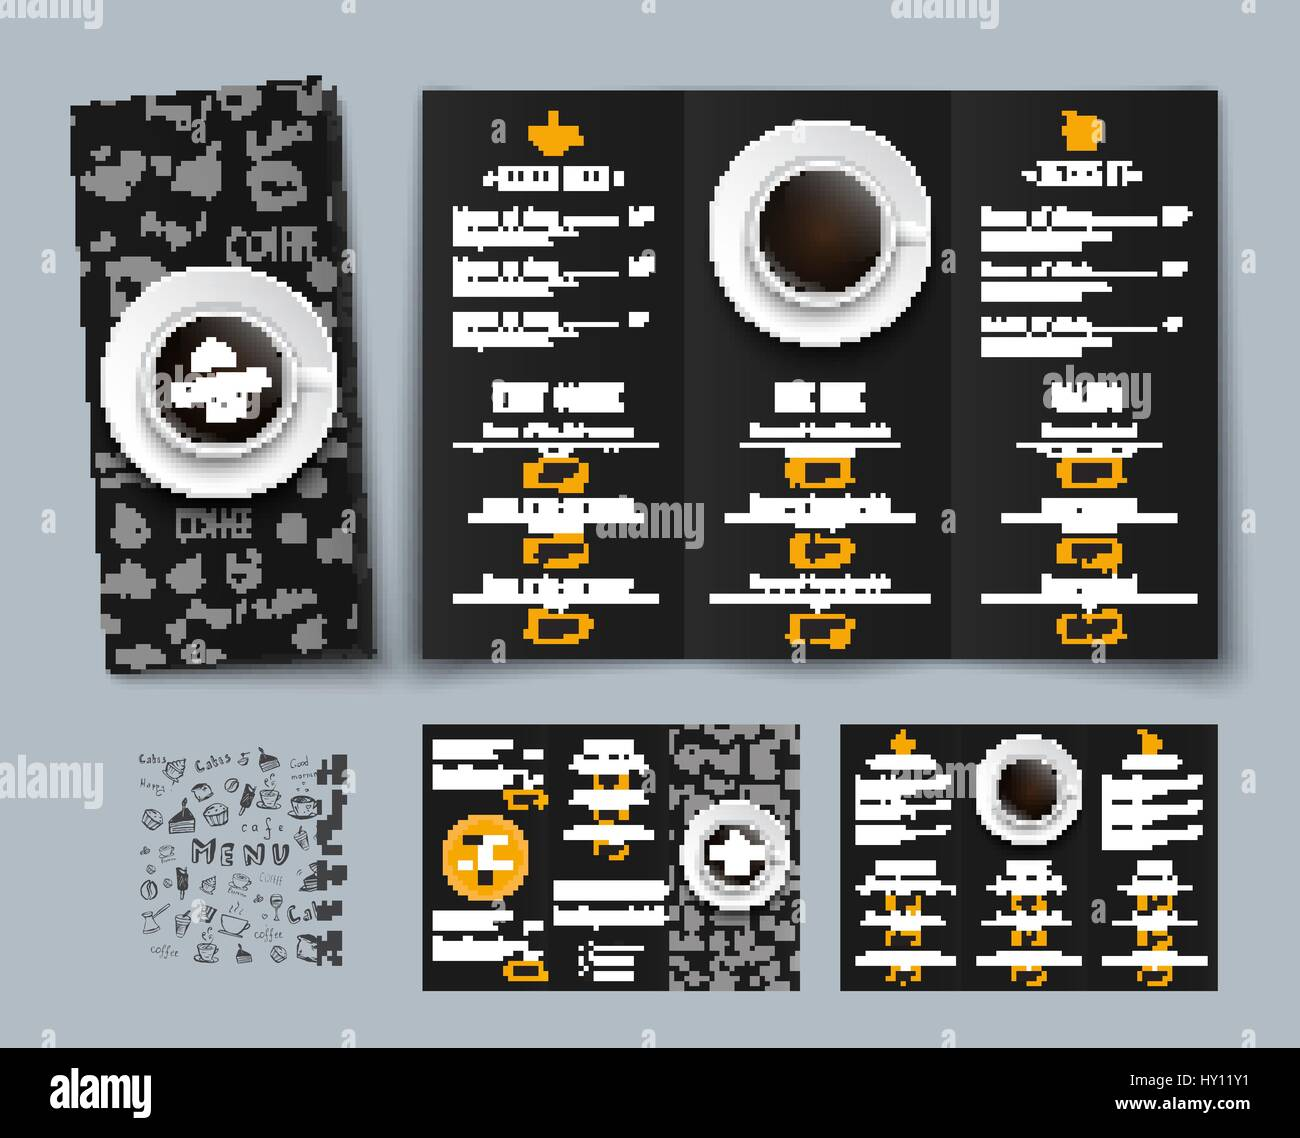 design of a triple black menu for cafes and restaurants templates